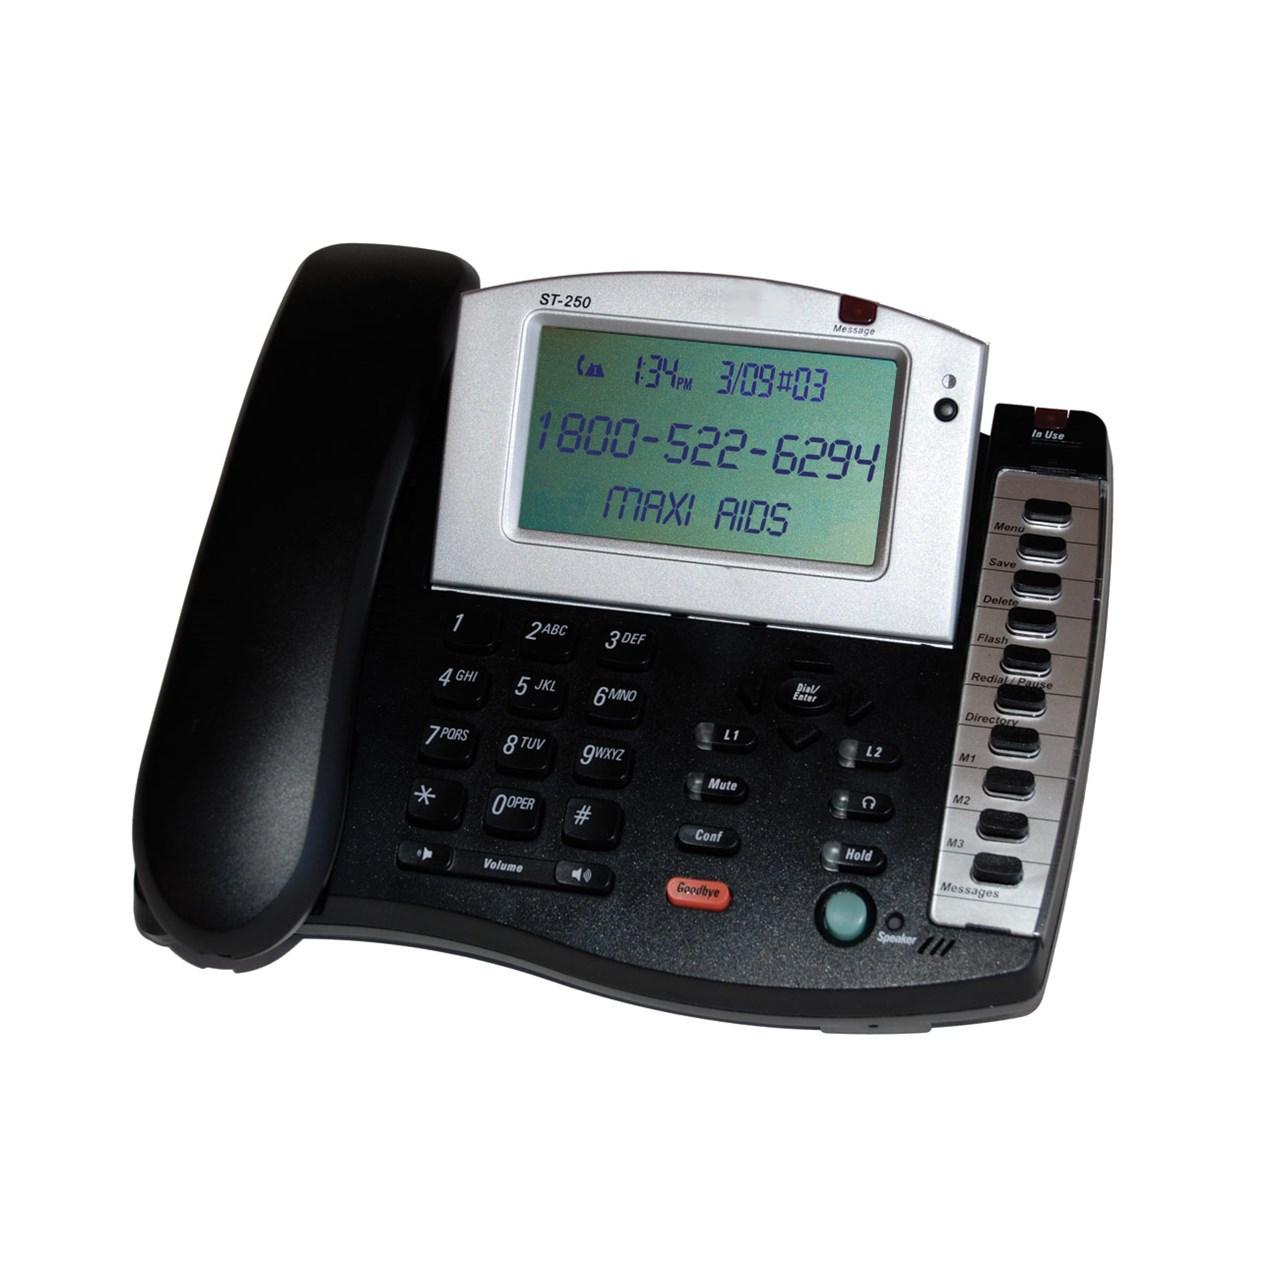 Fanstel 2-Line Amplified Business Speakerphone - 50dB